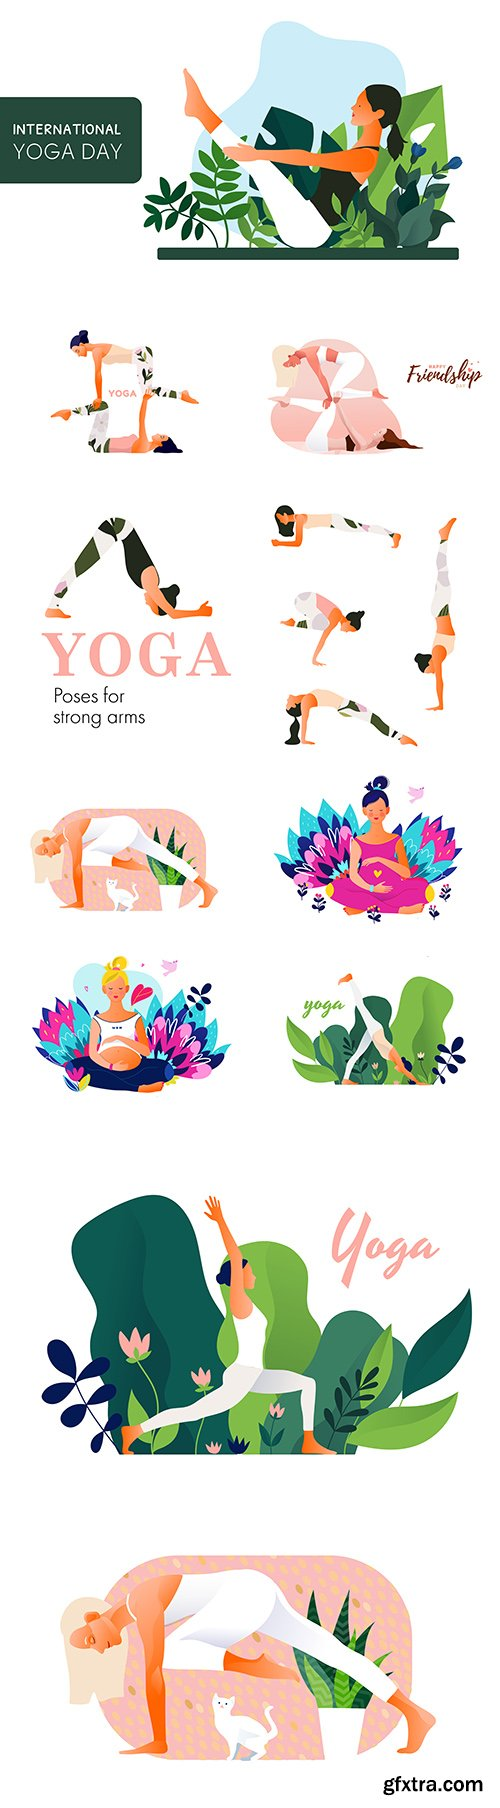 Yoga International day and meditation design illustration 2